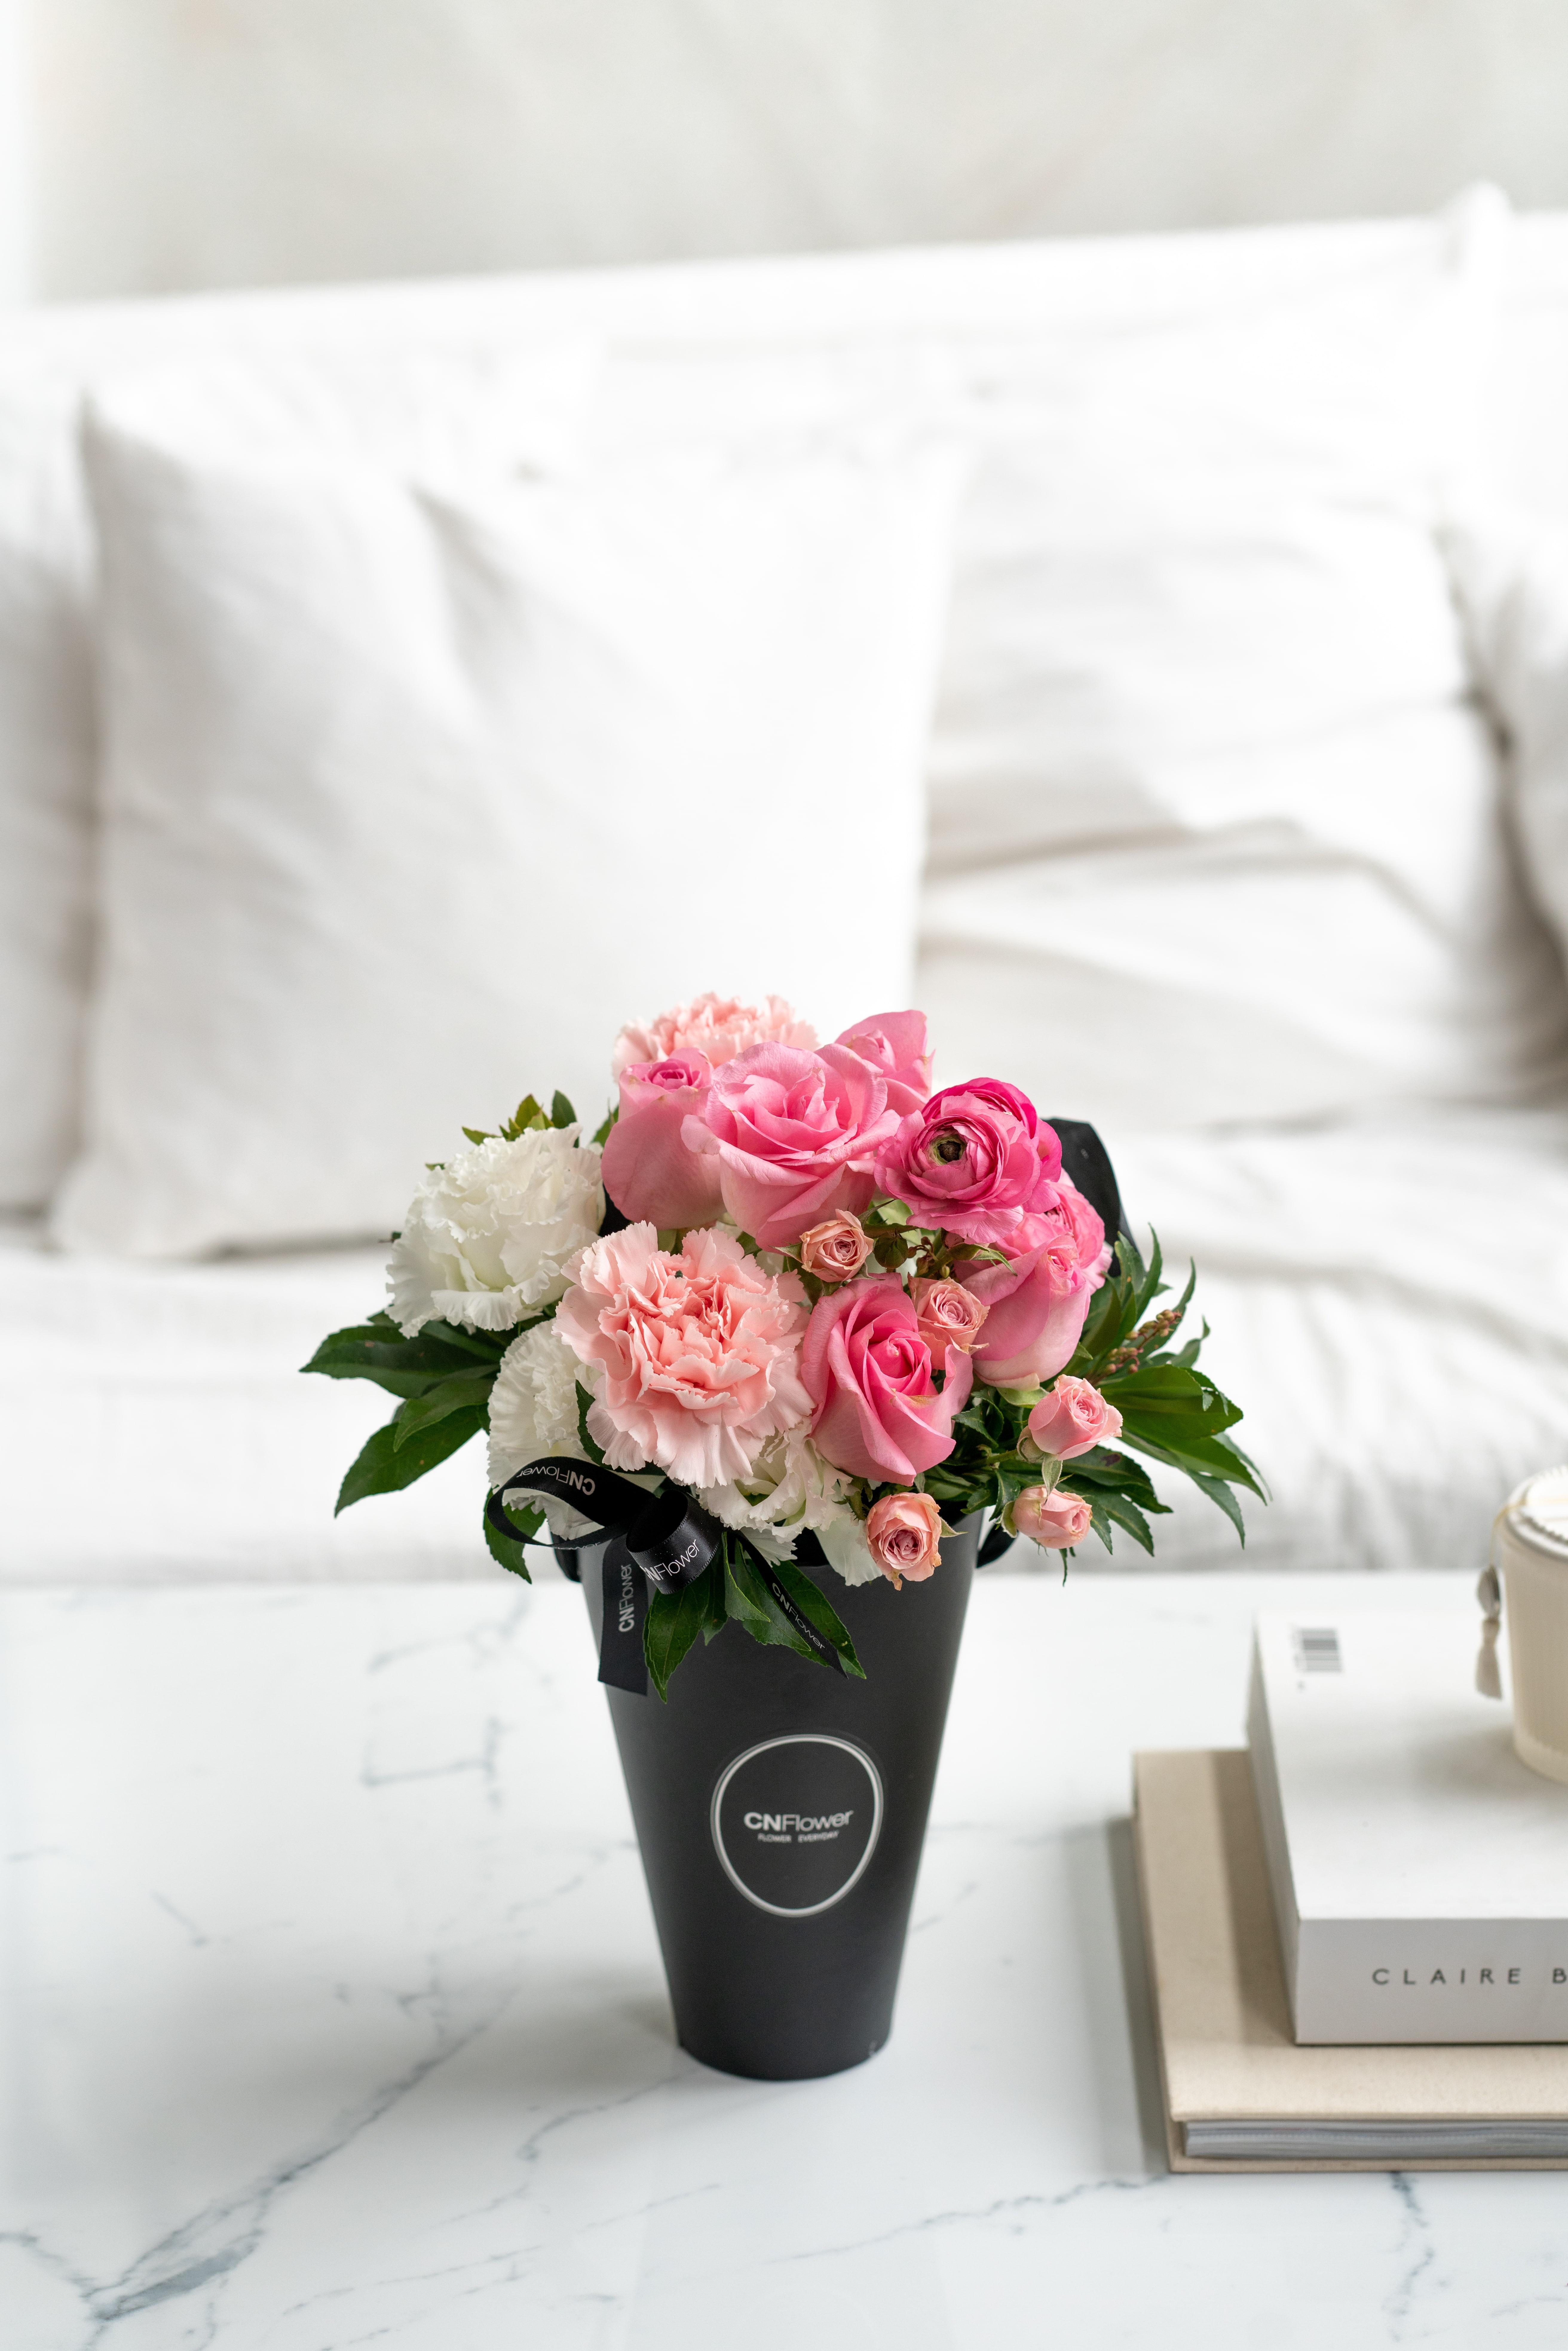 CNFlower 心動告白-CN黑色錐形提把花盒